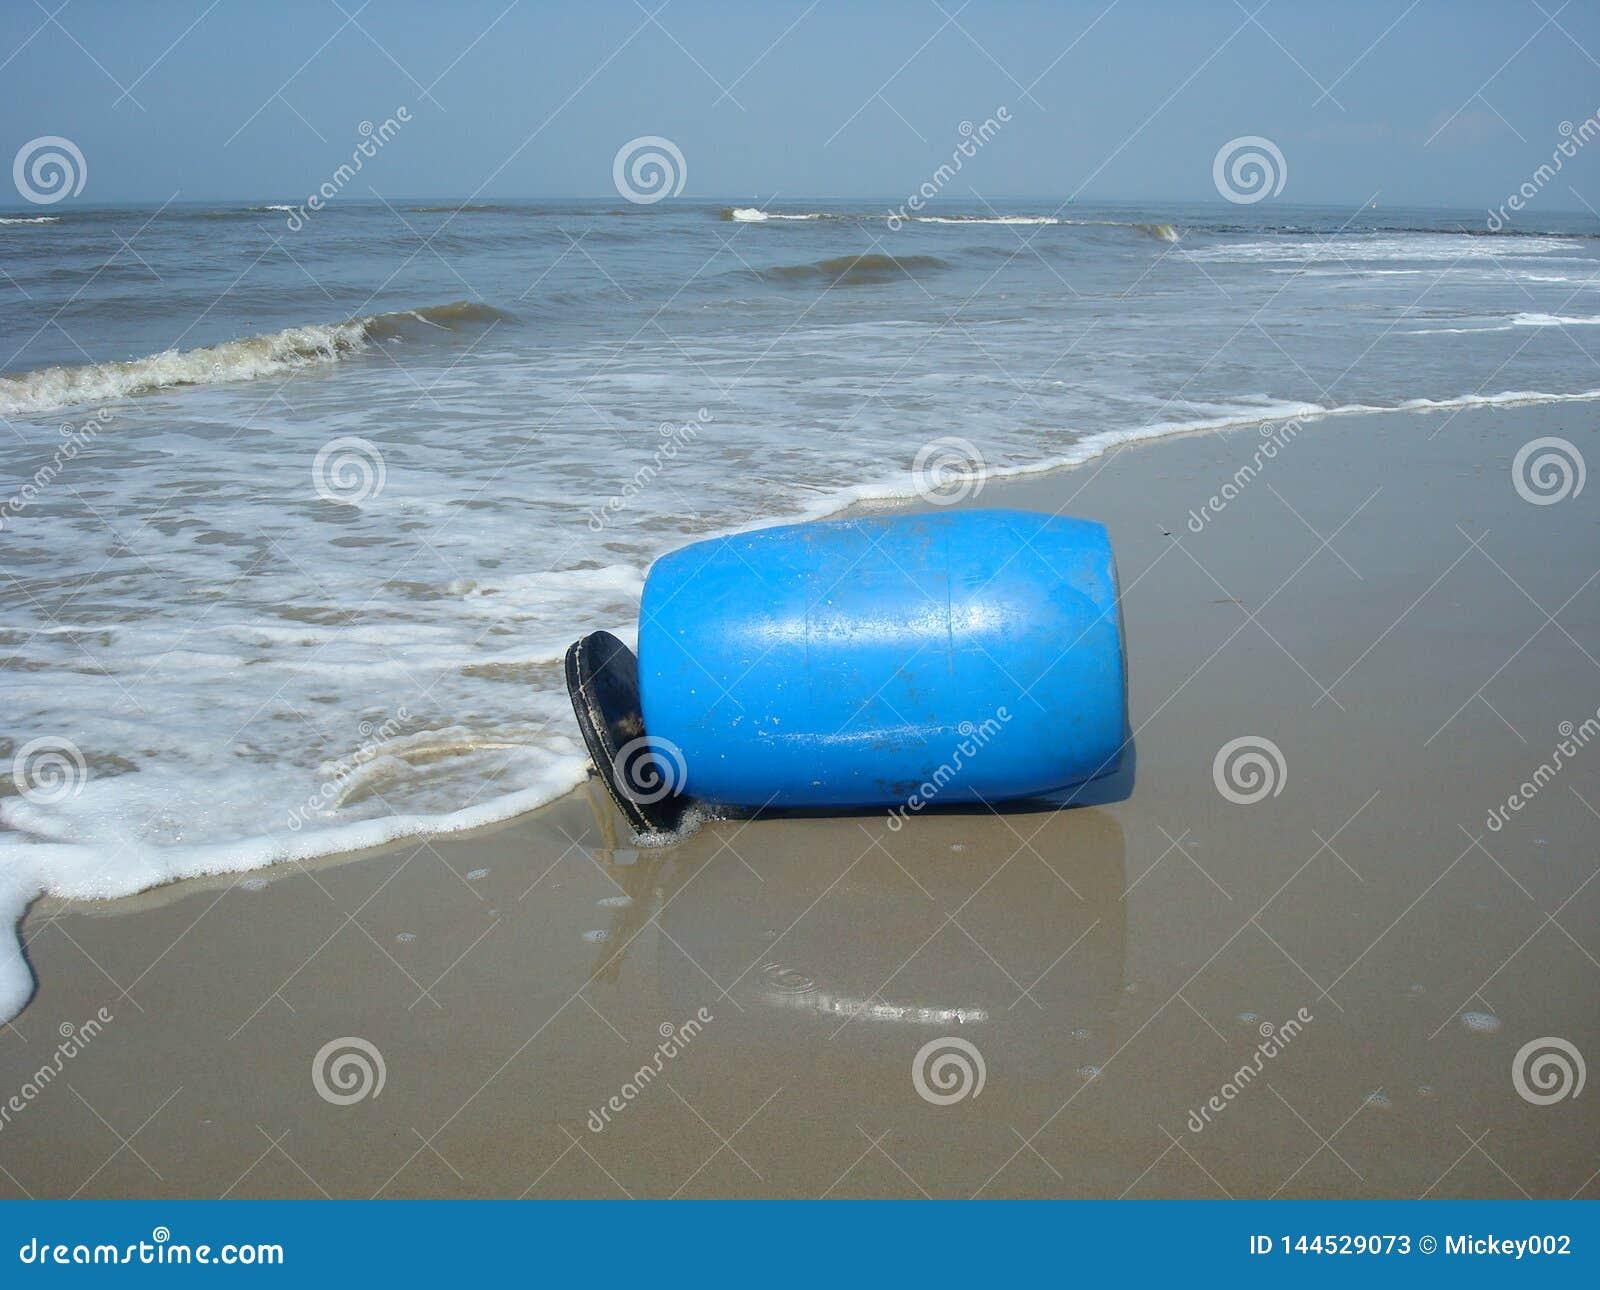 Plastic barrel on the beach